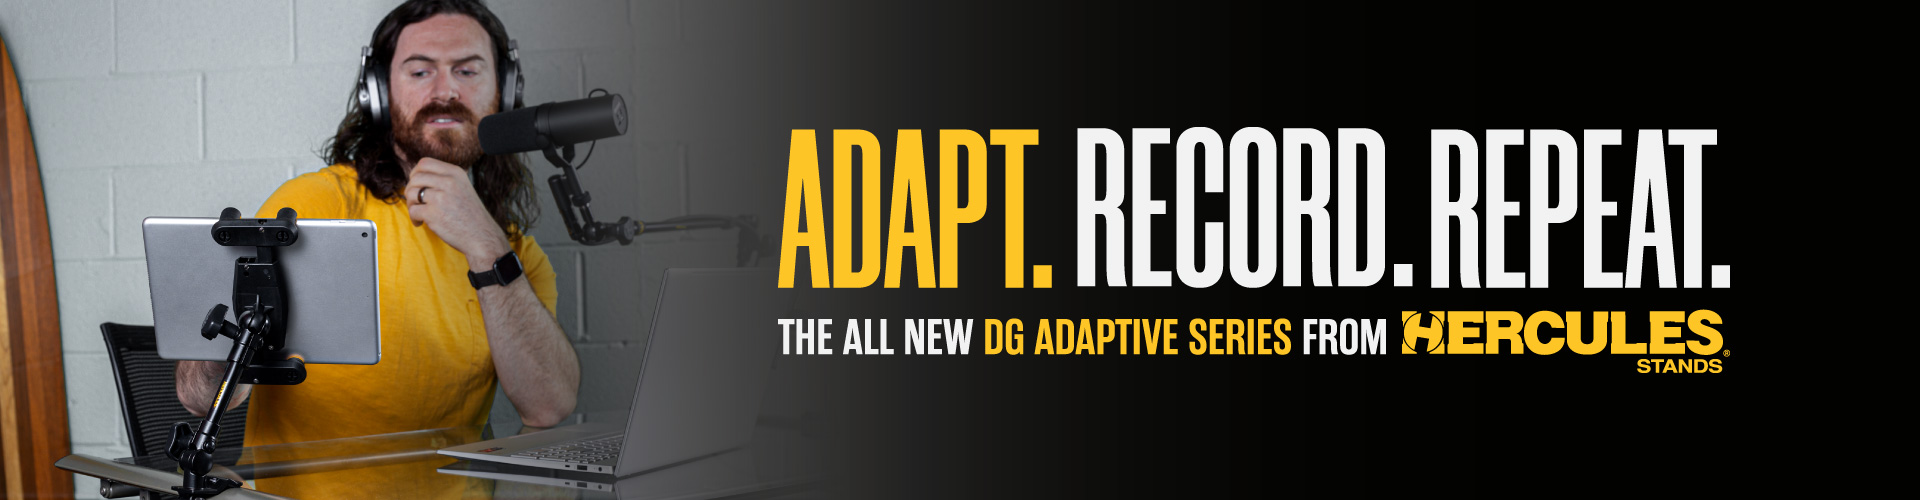 Adaptive Series Device Holders